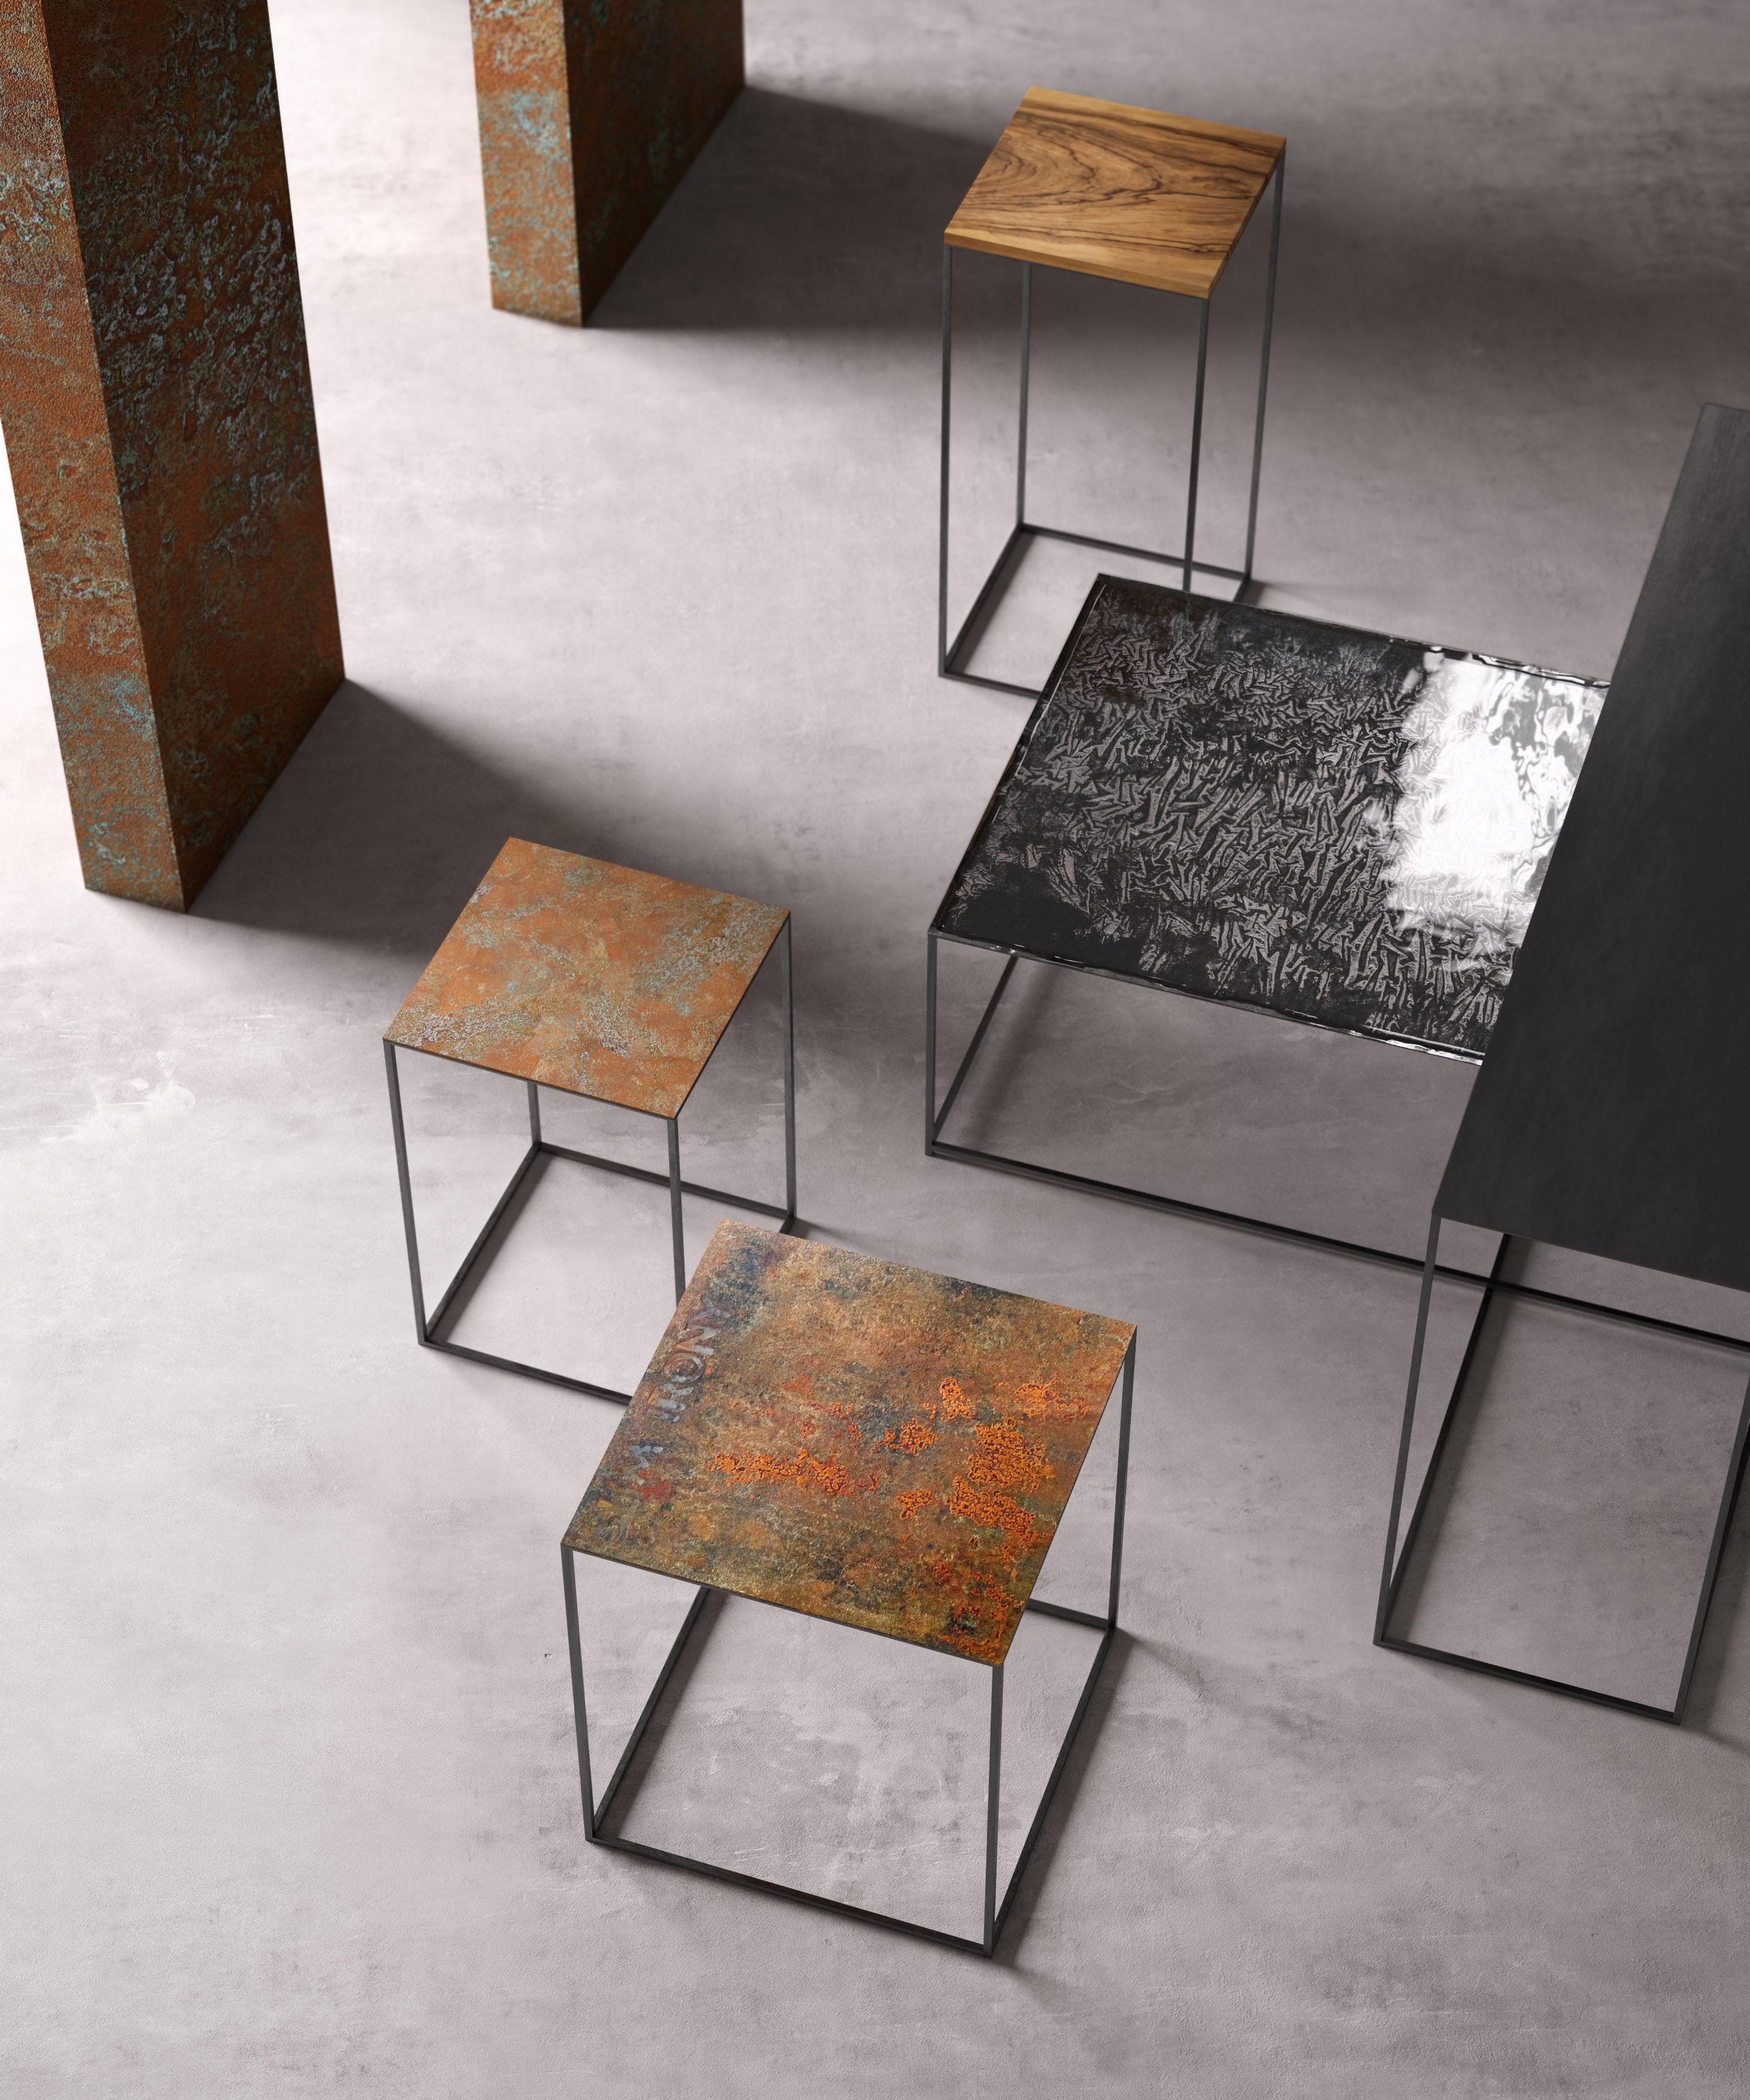 table basse slim irony art zeus m tal fondu pied noir. Black Bedroom Furniture Sets. Home Design Ideas